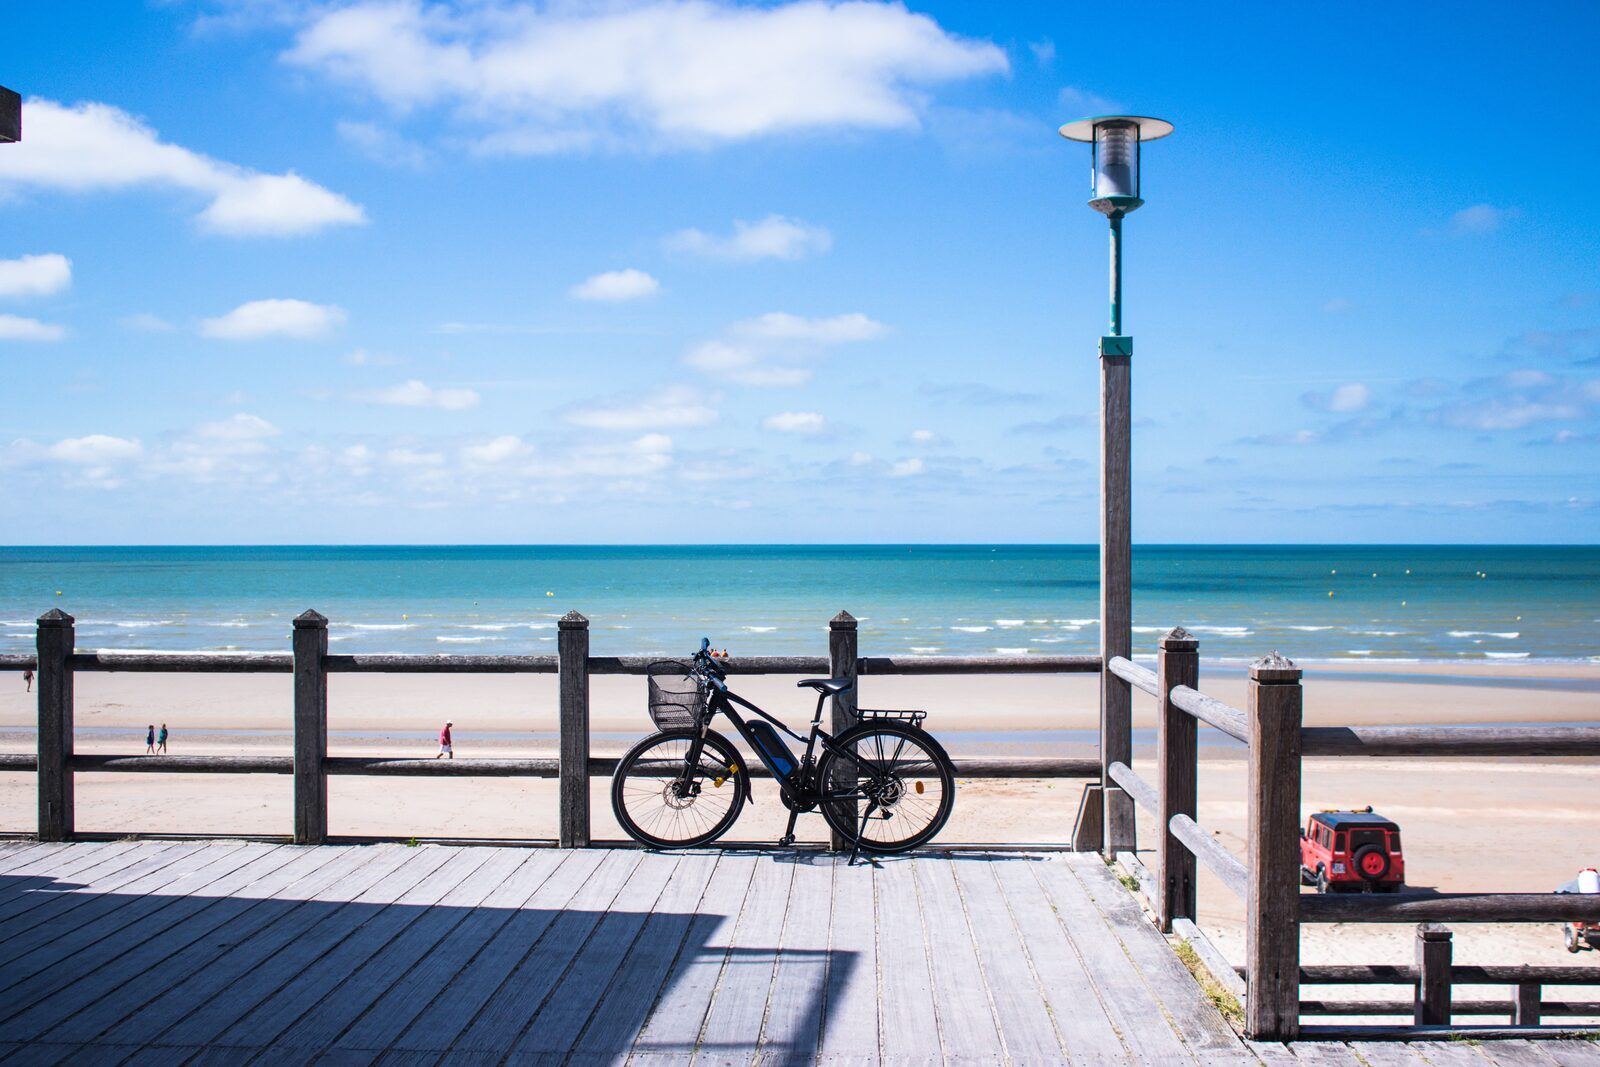 Beach of Dunkerque Zuydcoote Opal Coast